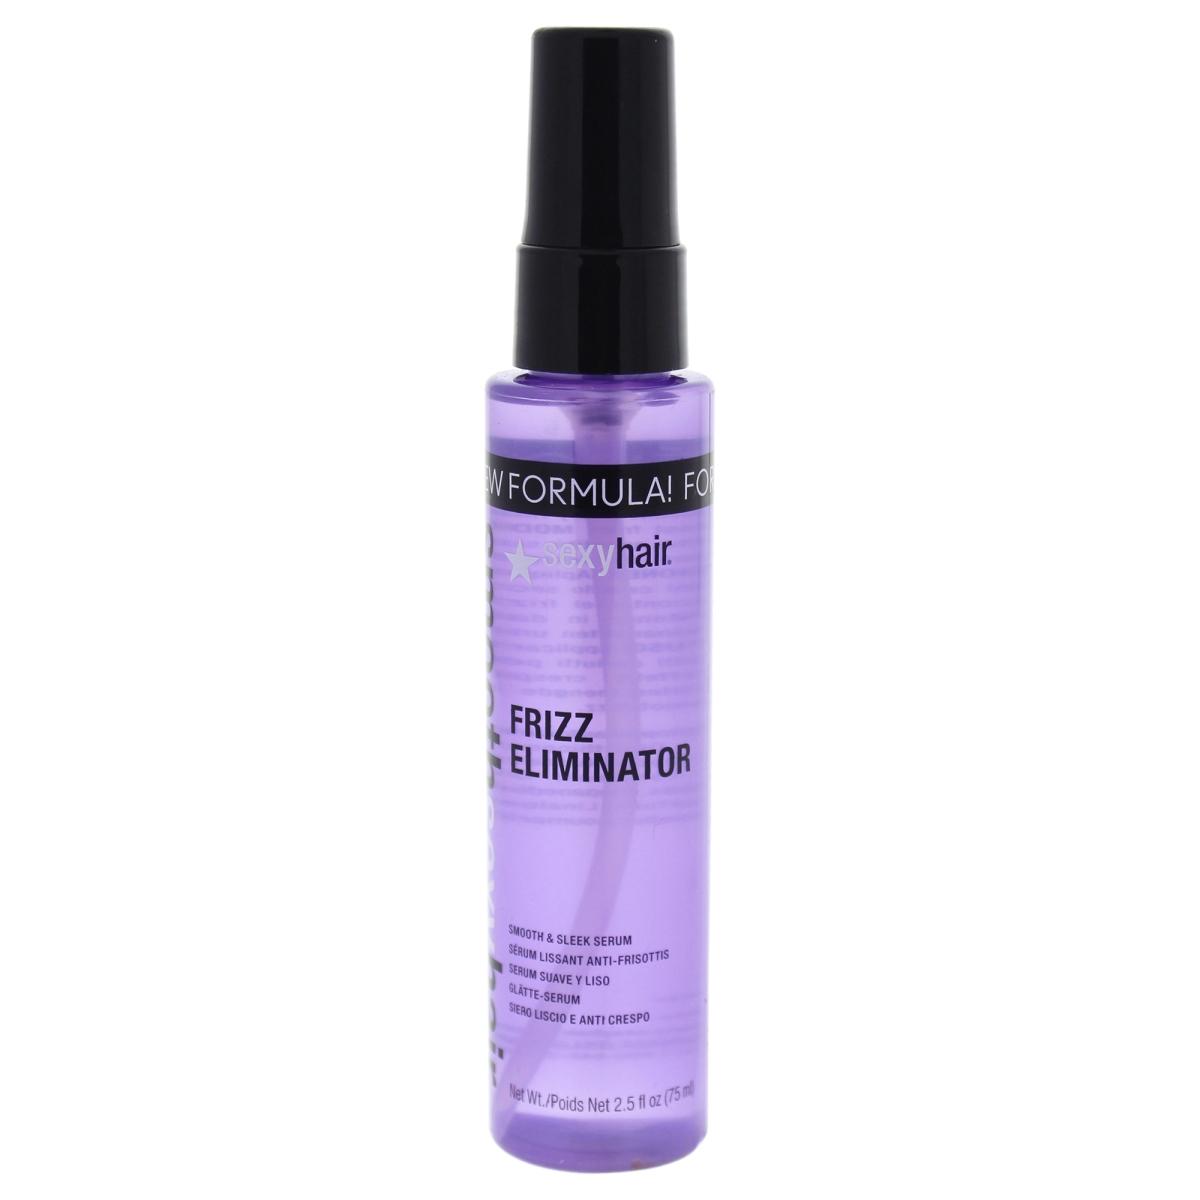 Sexy Hair U-HC-12014 2.5 oz Frizz Eliminator Smooth & Sleek Serum for Unisex